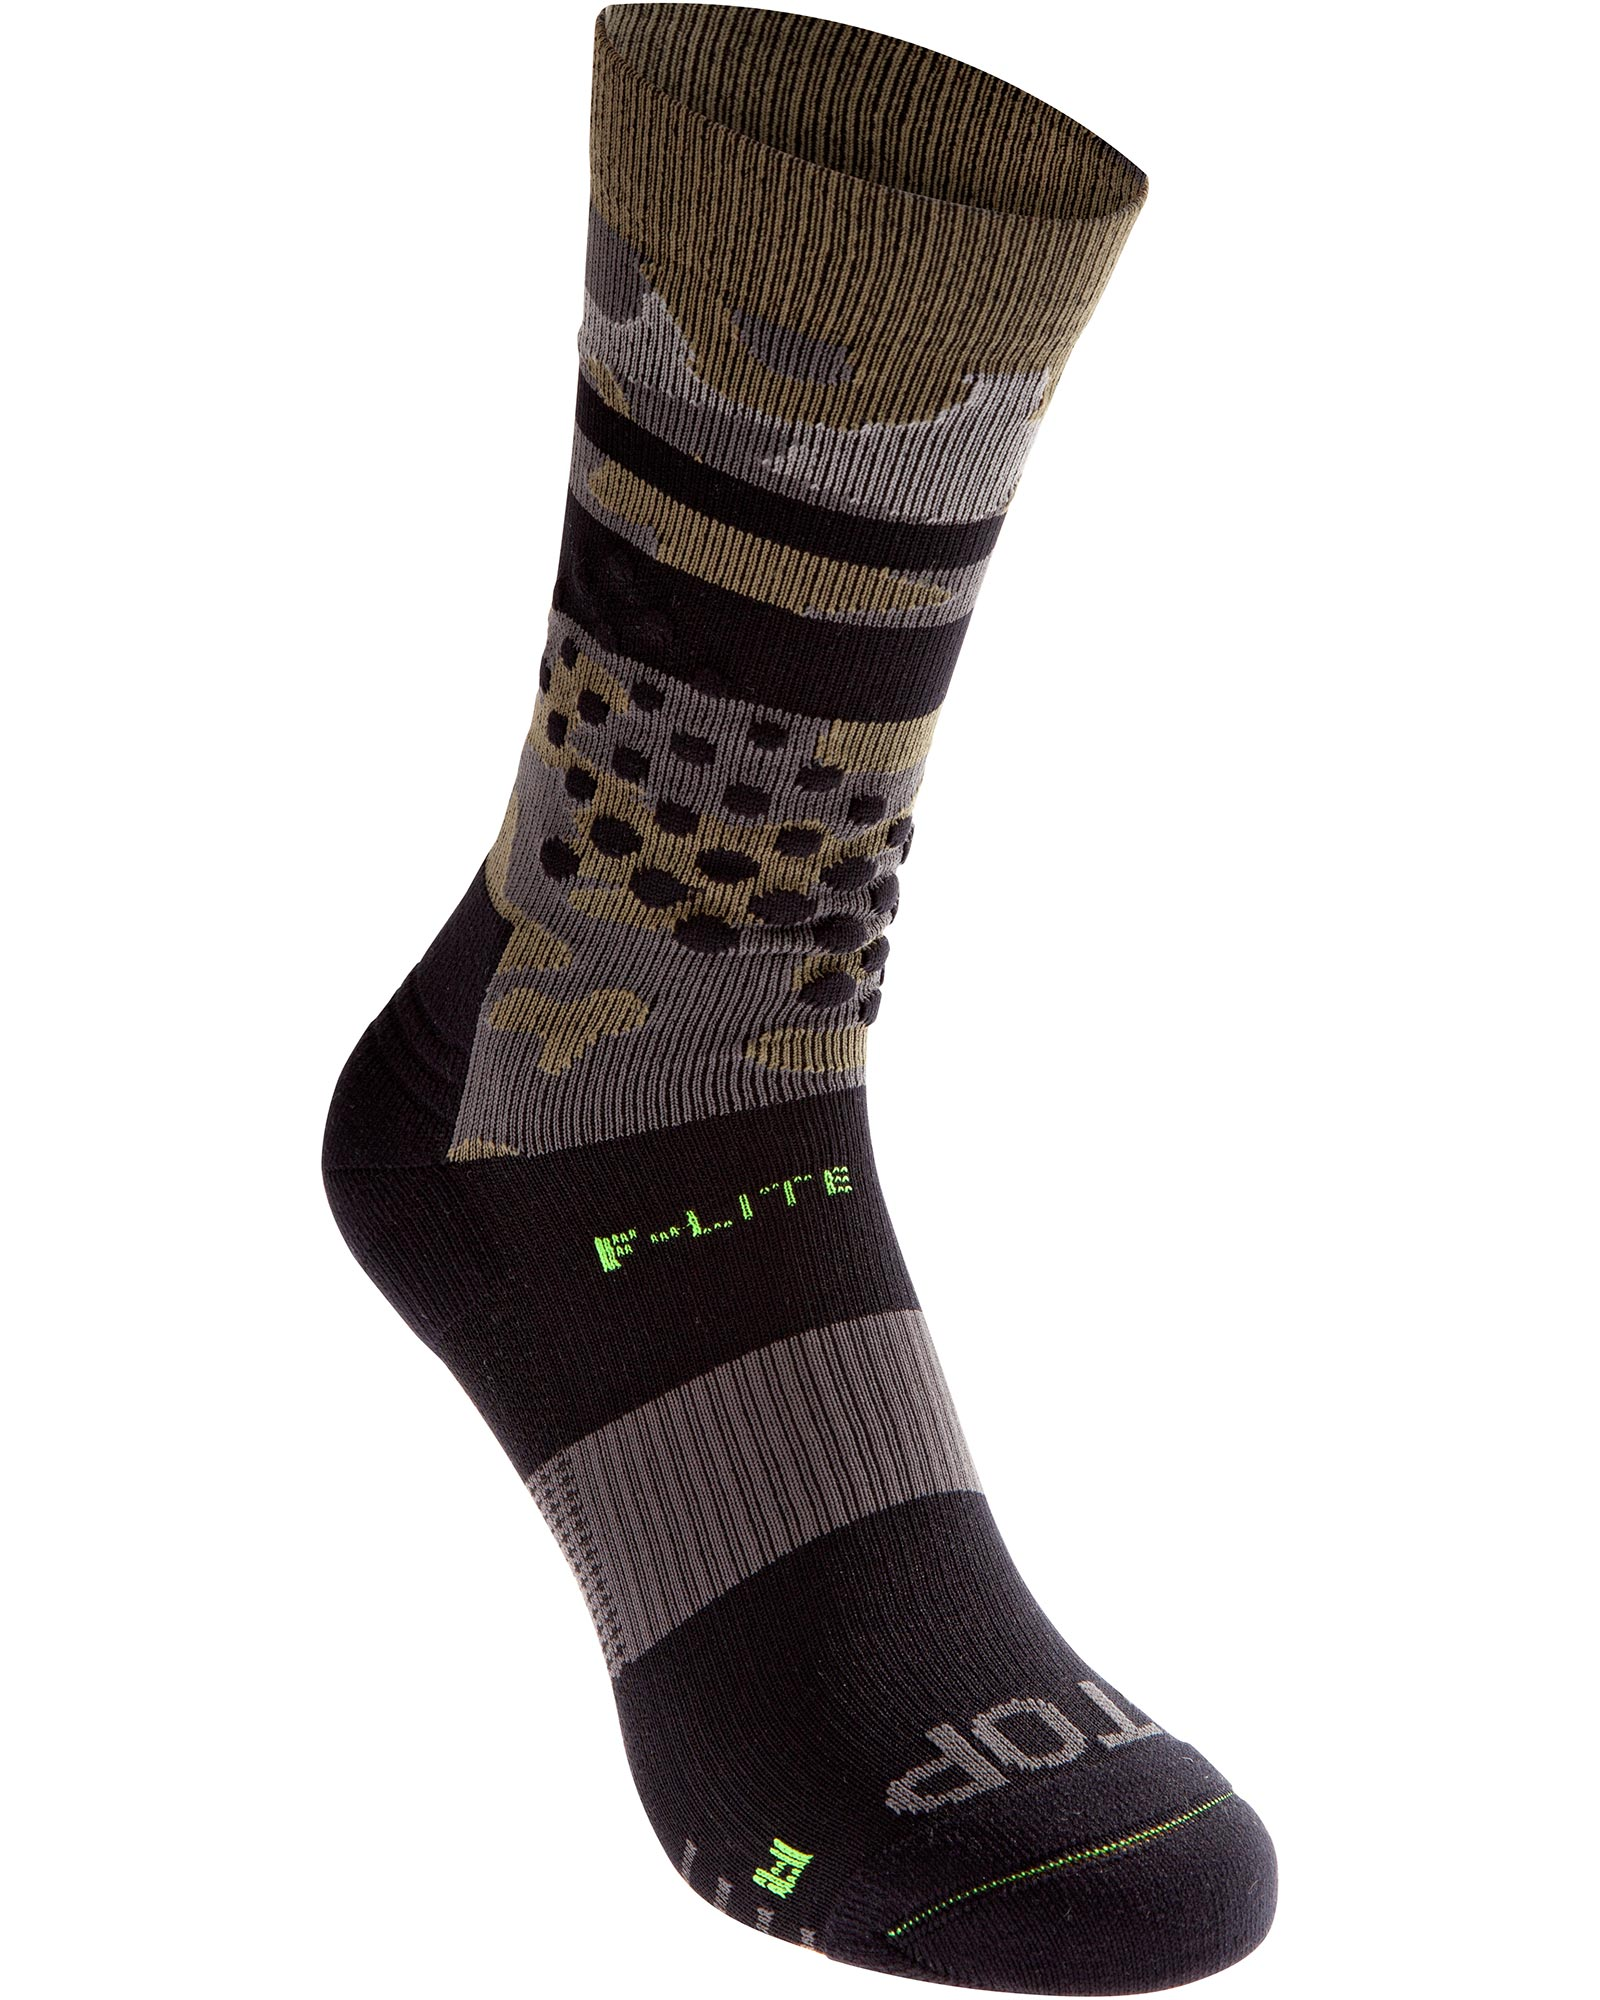 Inov-8 F-Lite Crew Socks 0